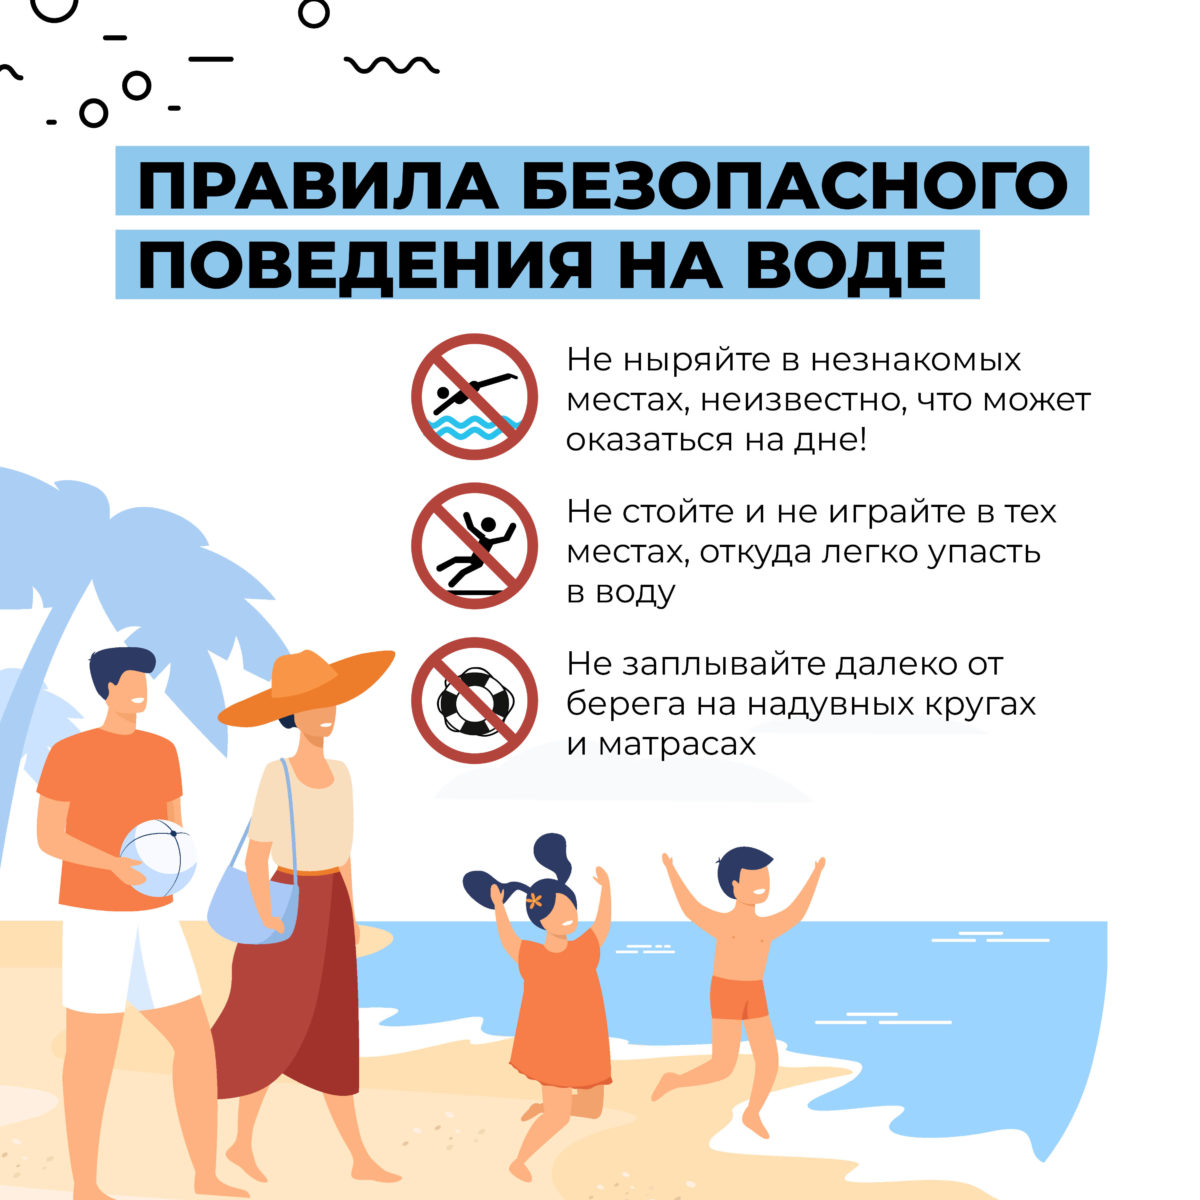 Лето, жара. Правила безопасного поведения на воде